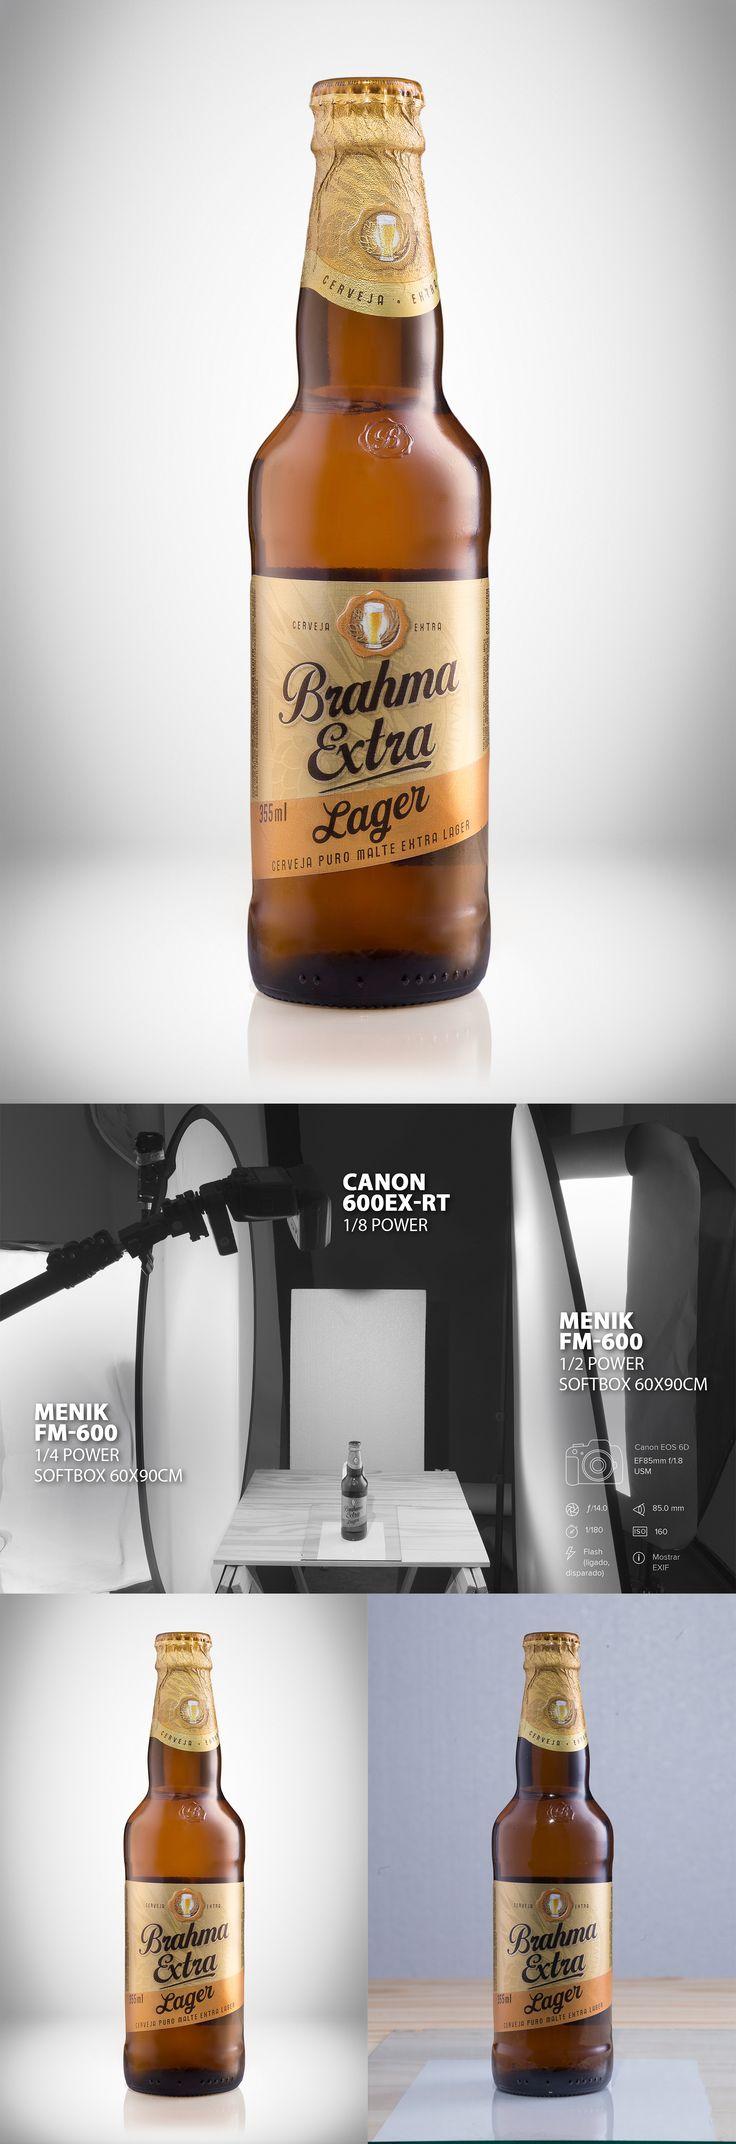 1º Test Beer Setup Light #setup #light #setuplight #still #product #beer #bottle